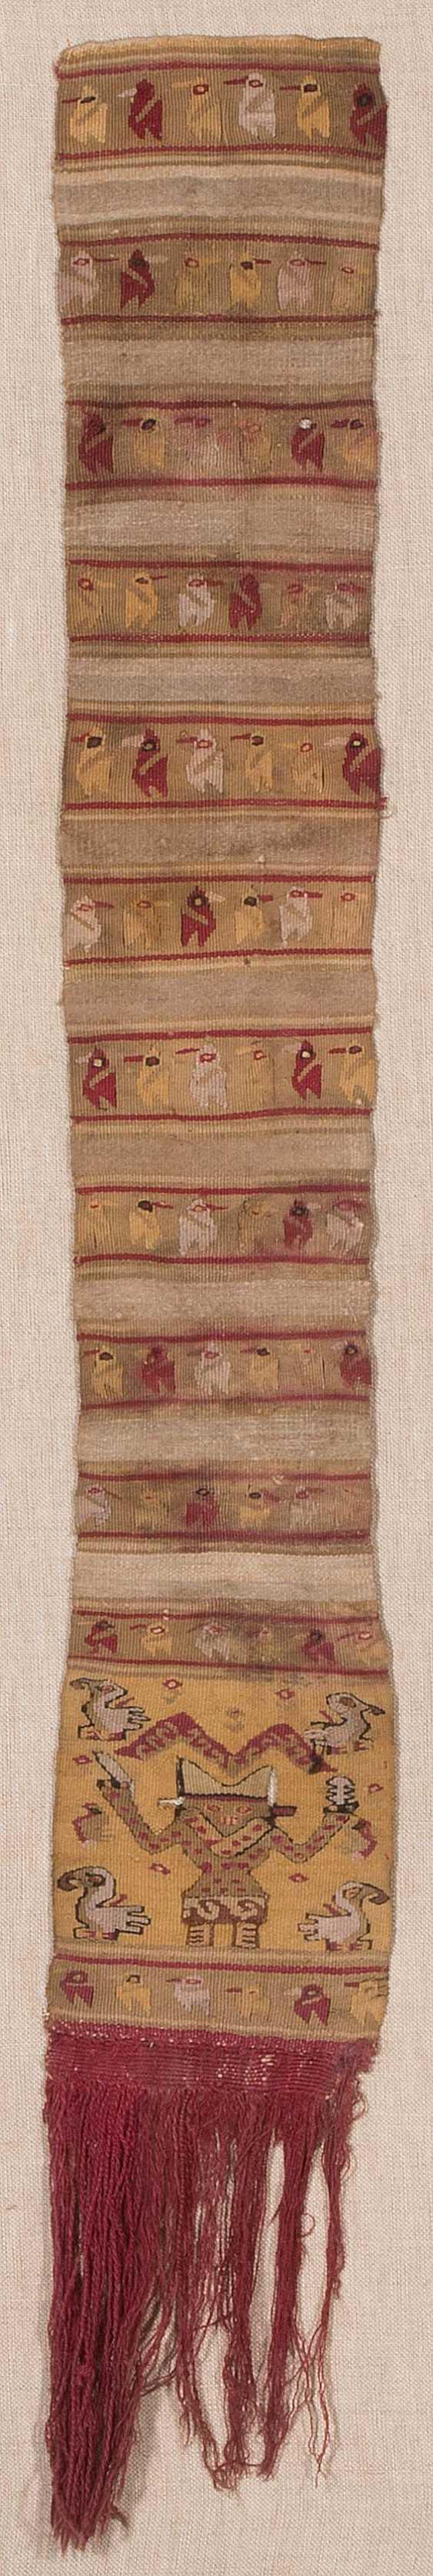 2 textile fragments - photo 1